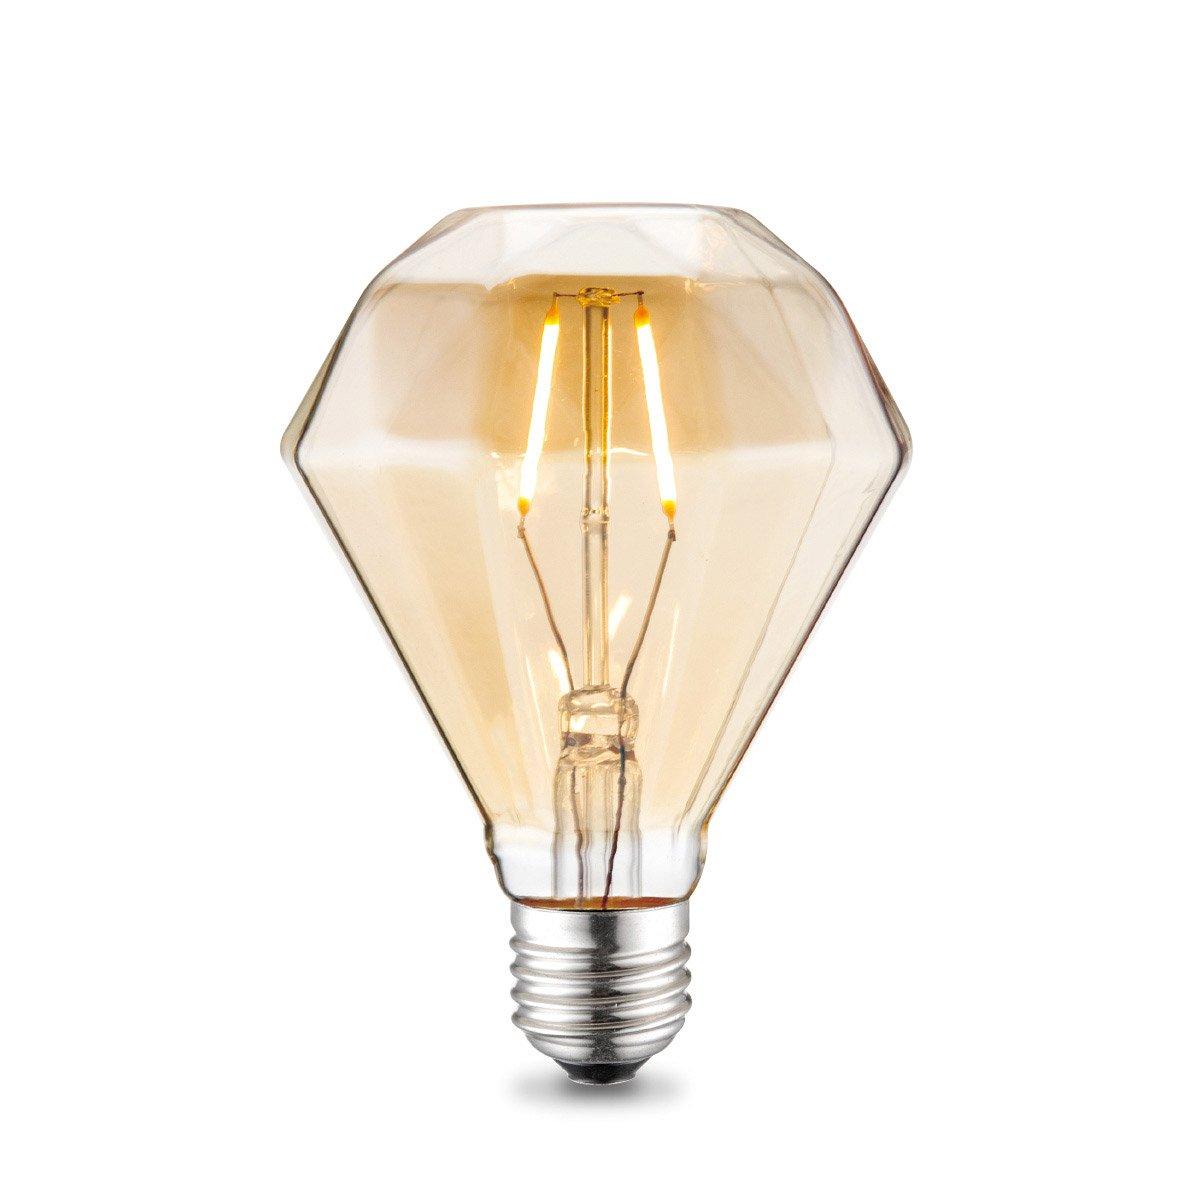 Grosse Ampoule Vintage Leroy Merlin